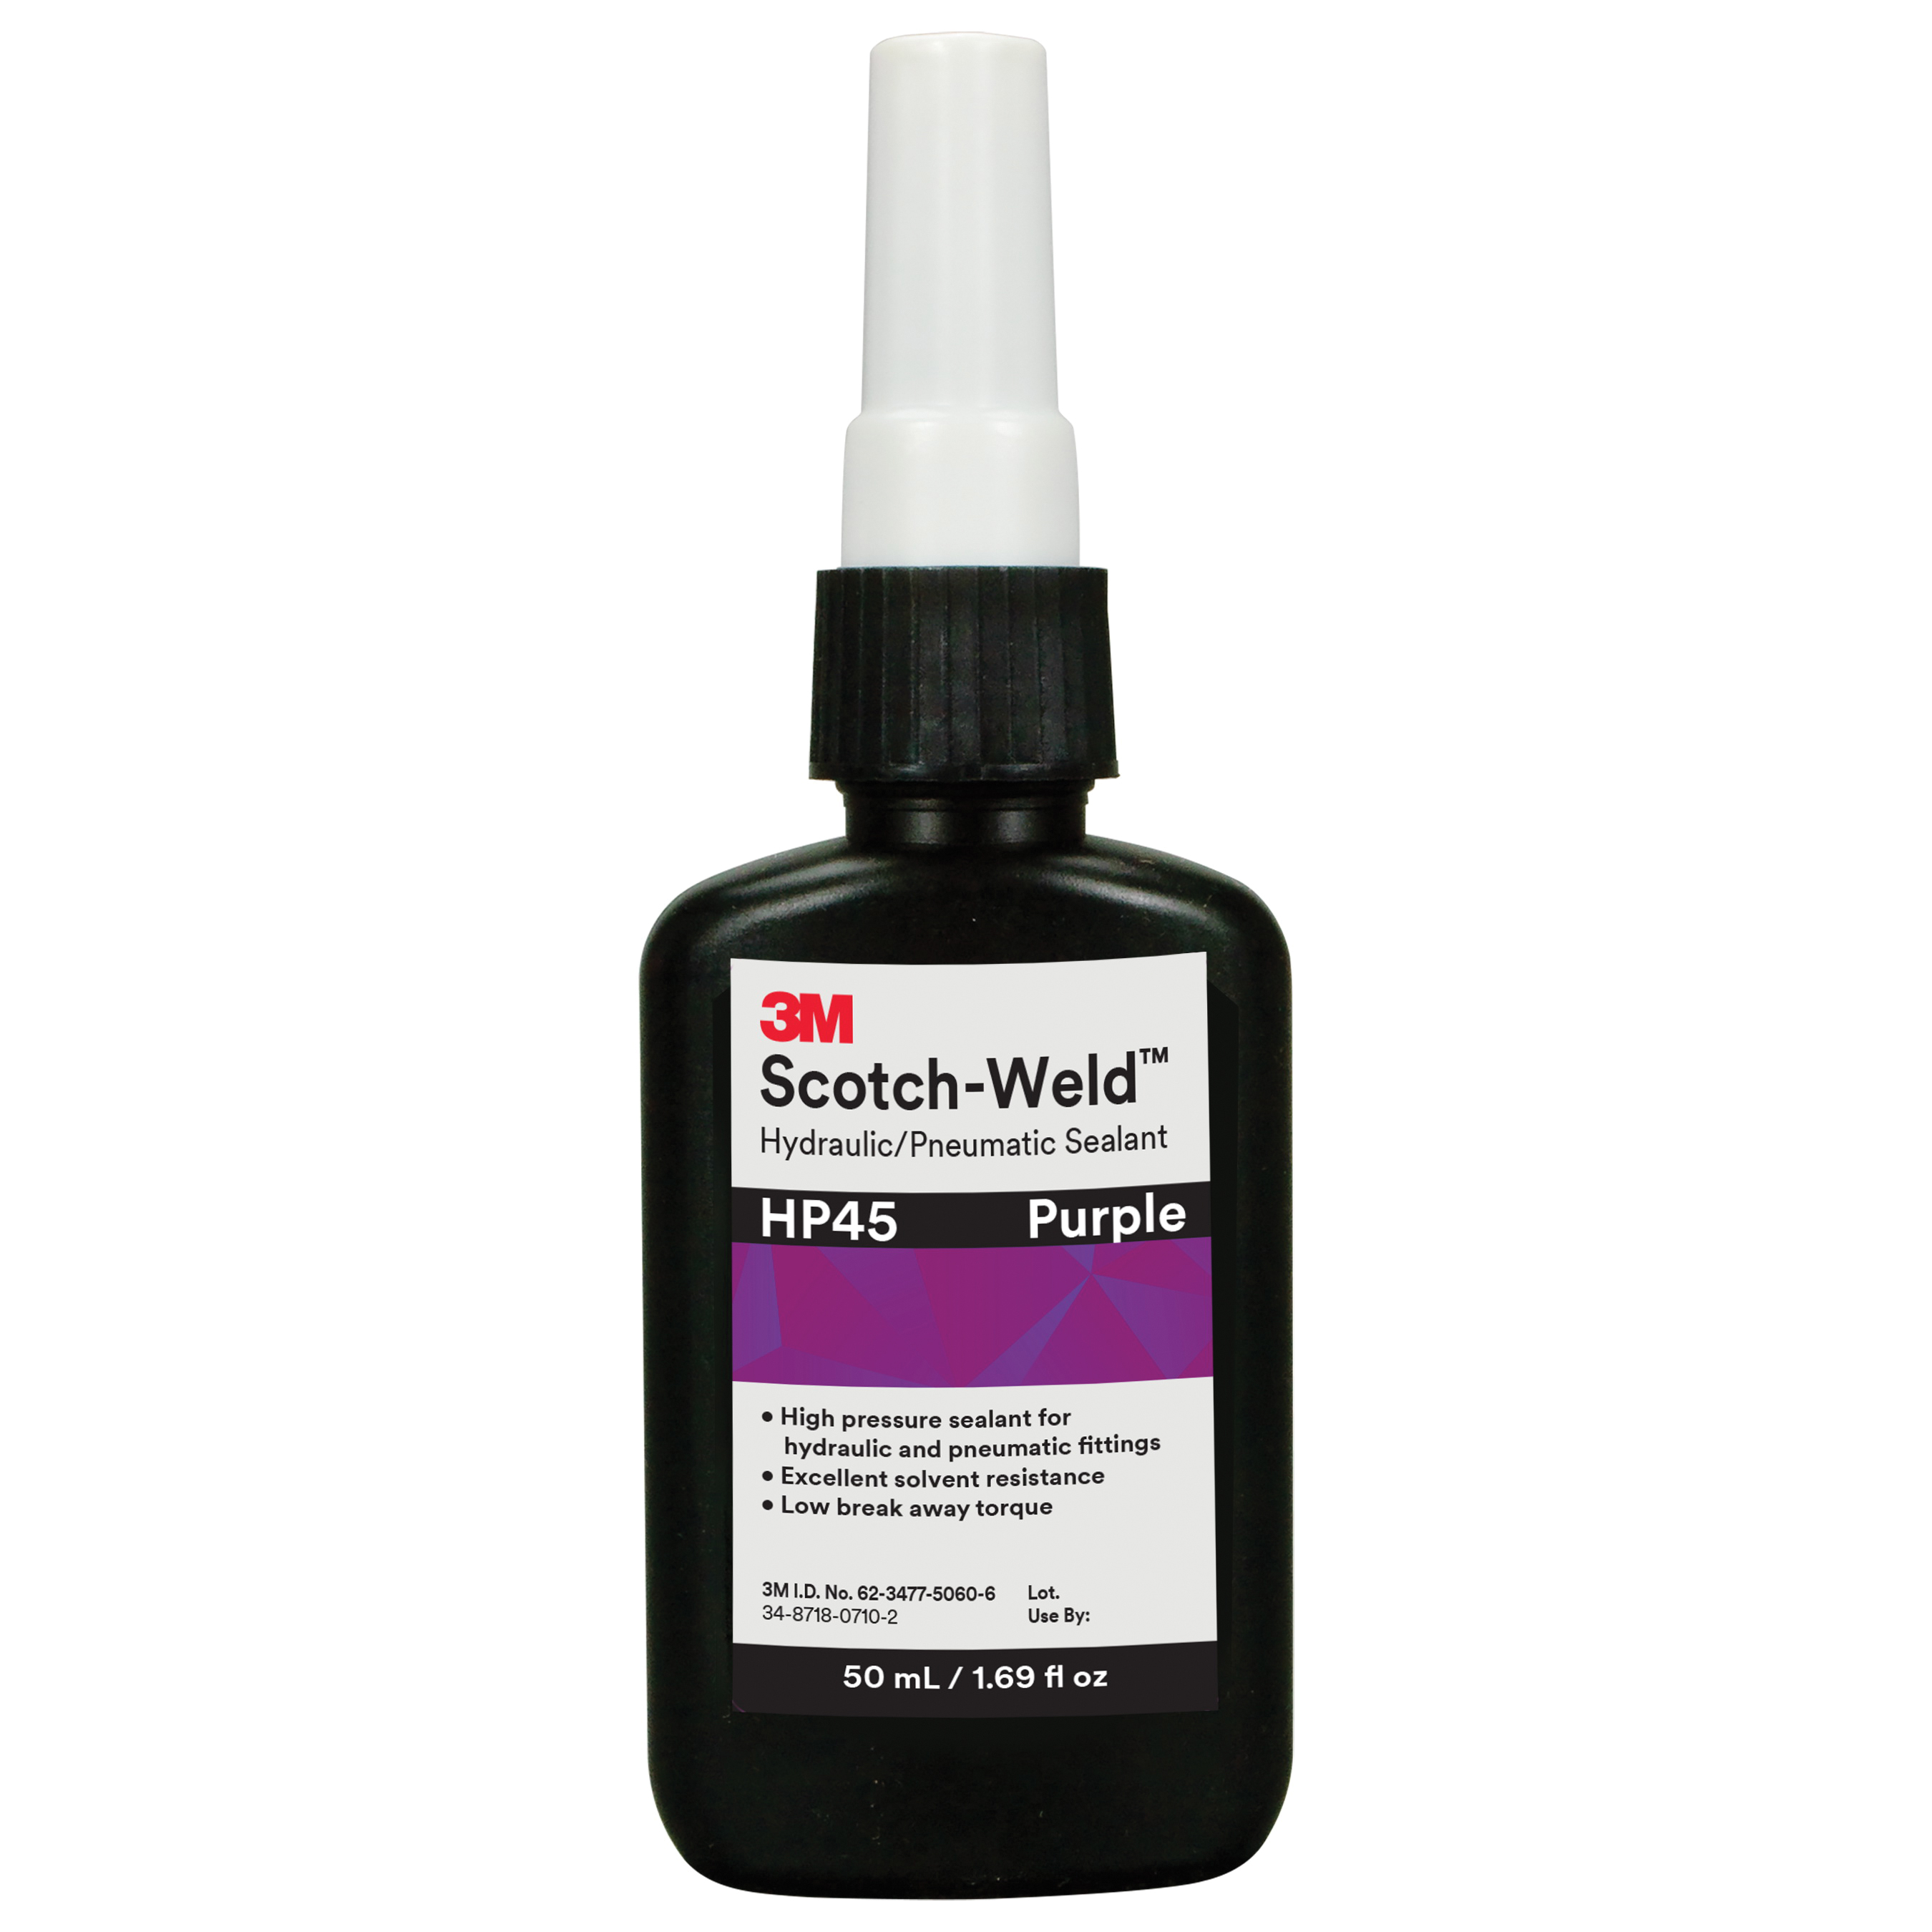 Scotch-Weld™ 048011-62613 Anaerobic Adhesive High Strength Threadlocker, 50 mL Bottle, Thixotropic Liquid Form, Red